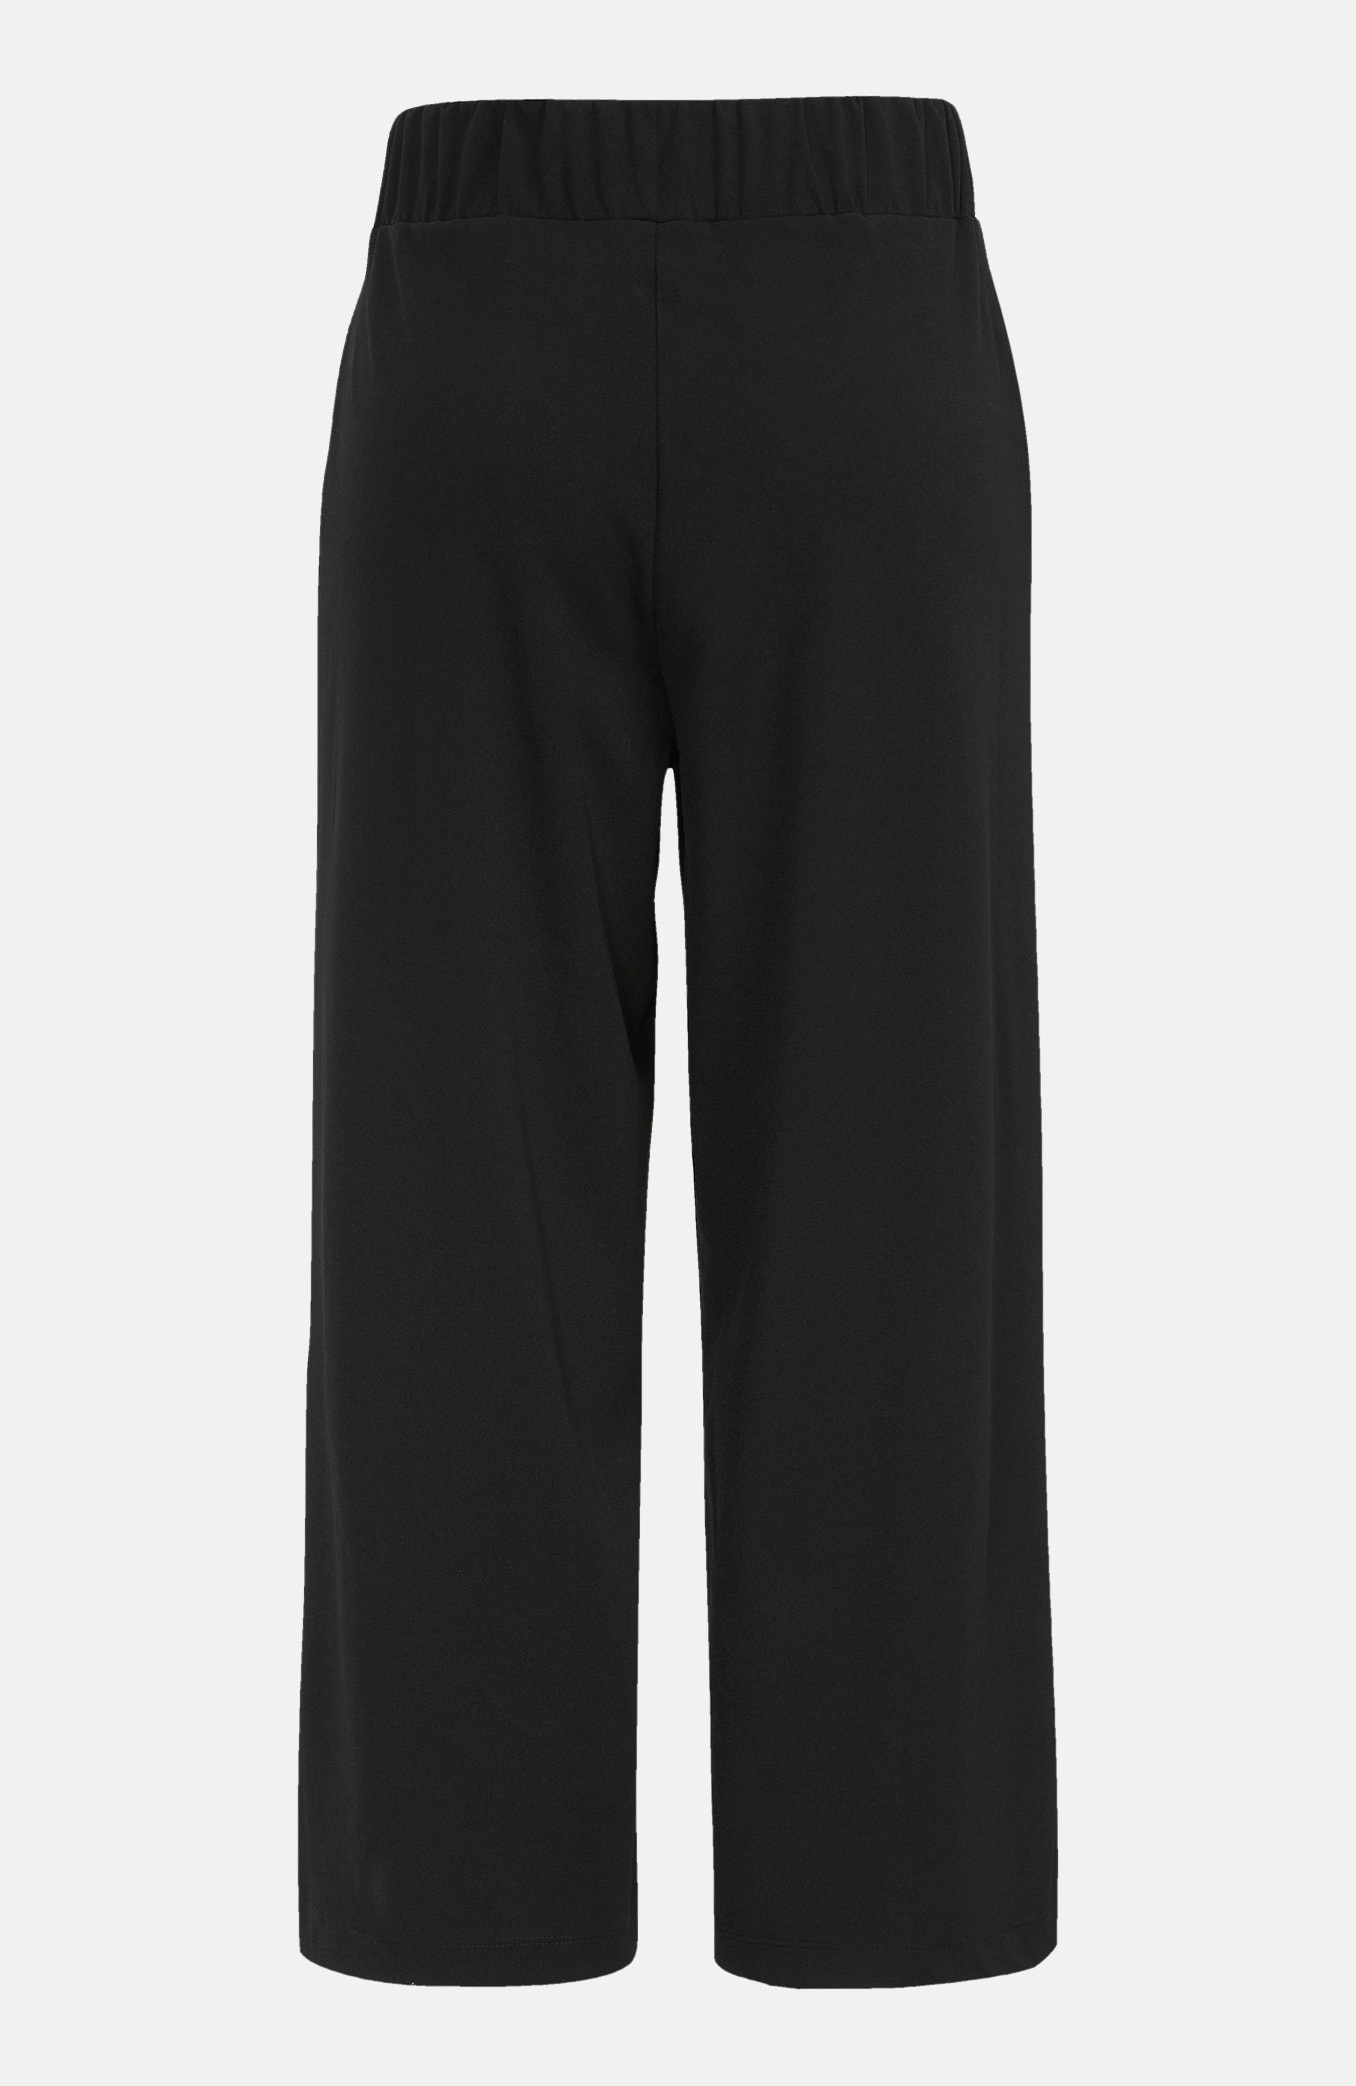 Spodnie typu culotte Siham